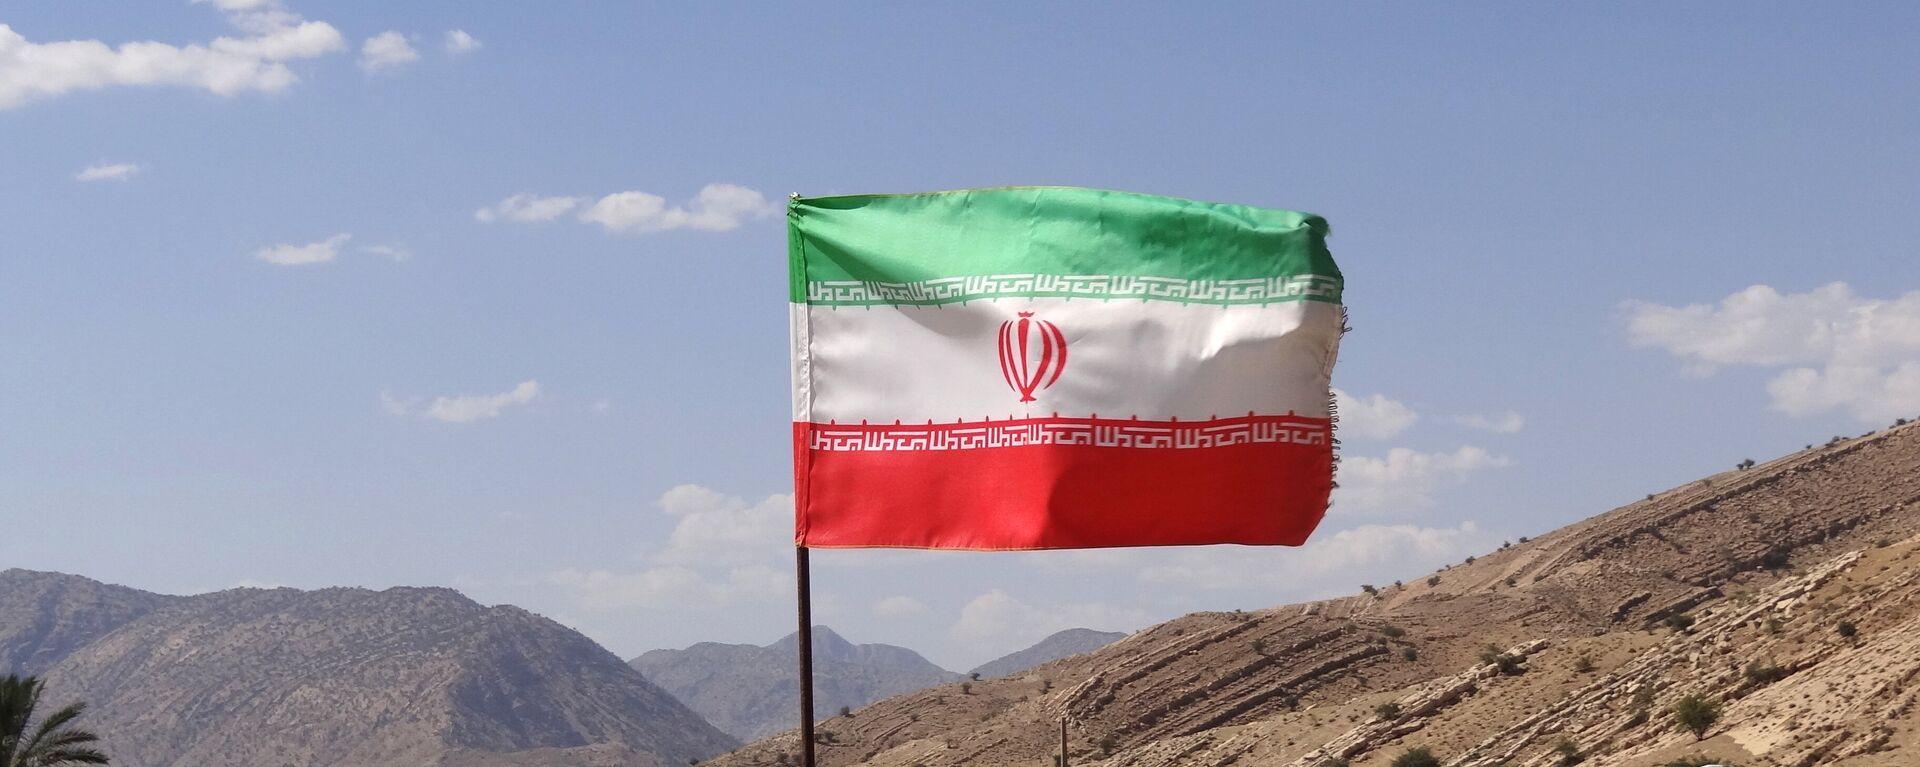 Bandera de Irán - Sputnik Mundo, 1920, 17.09.2021